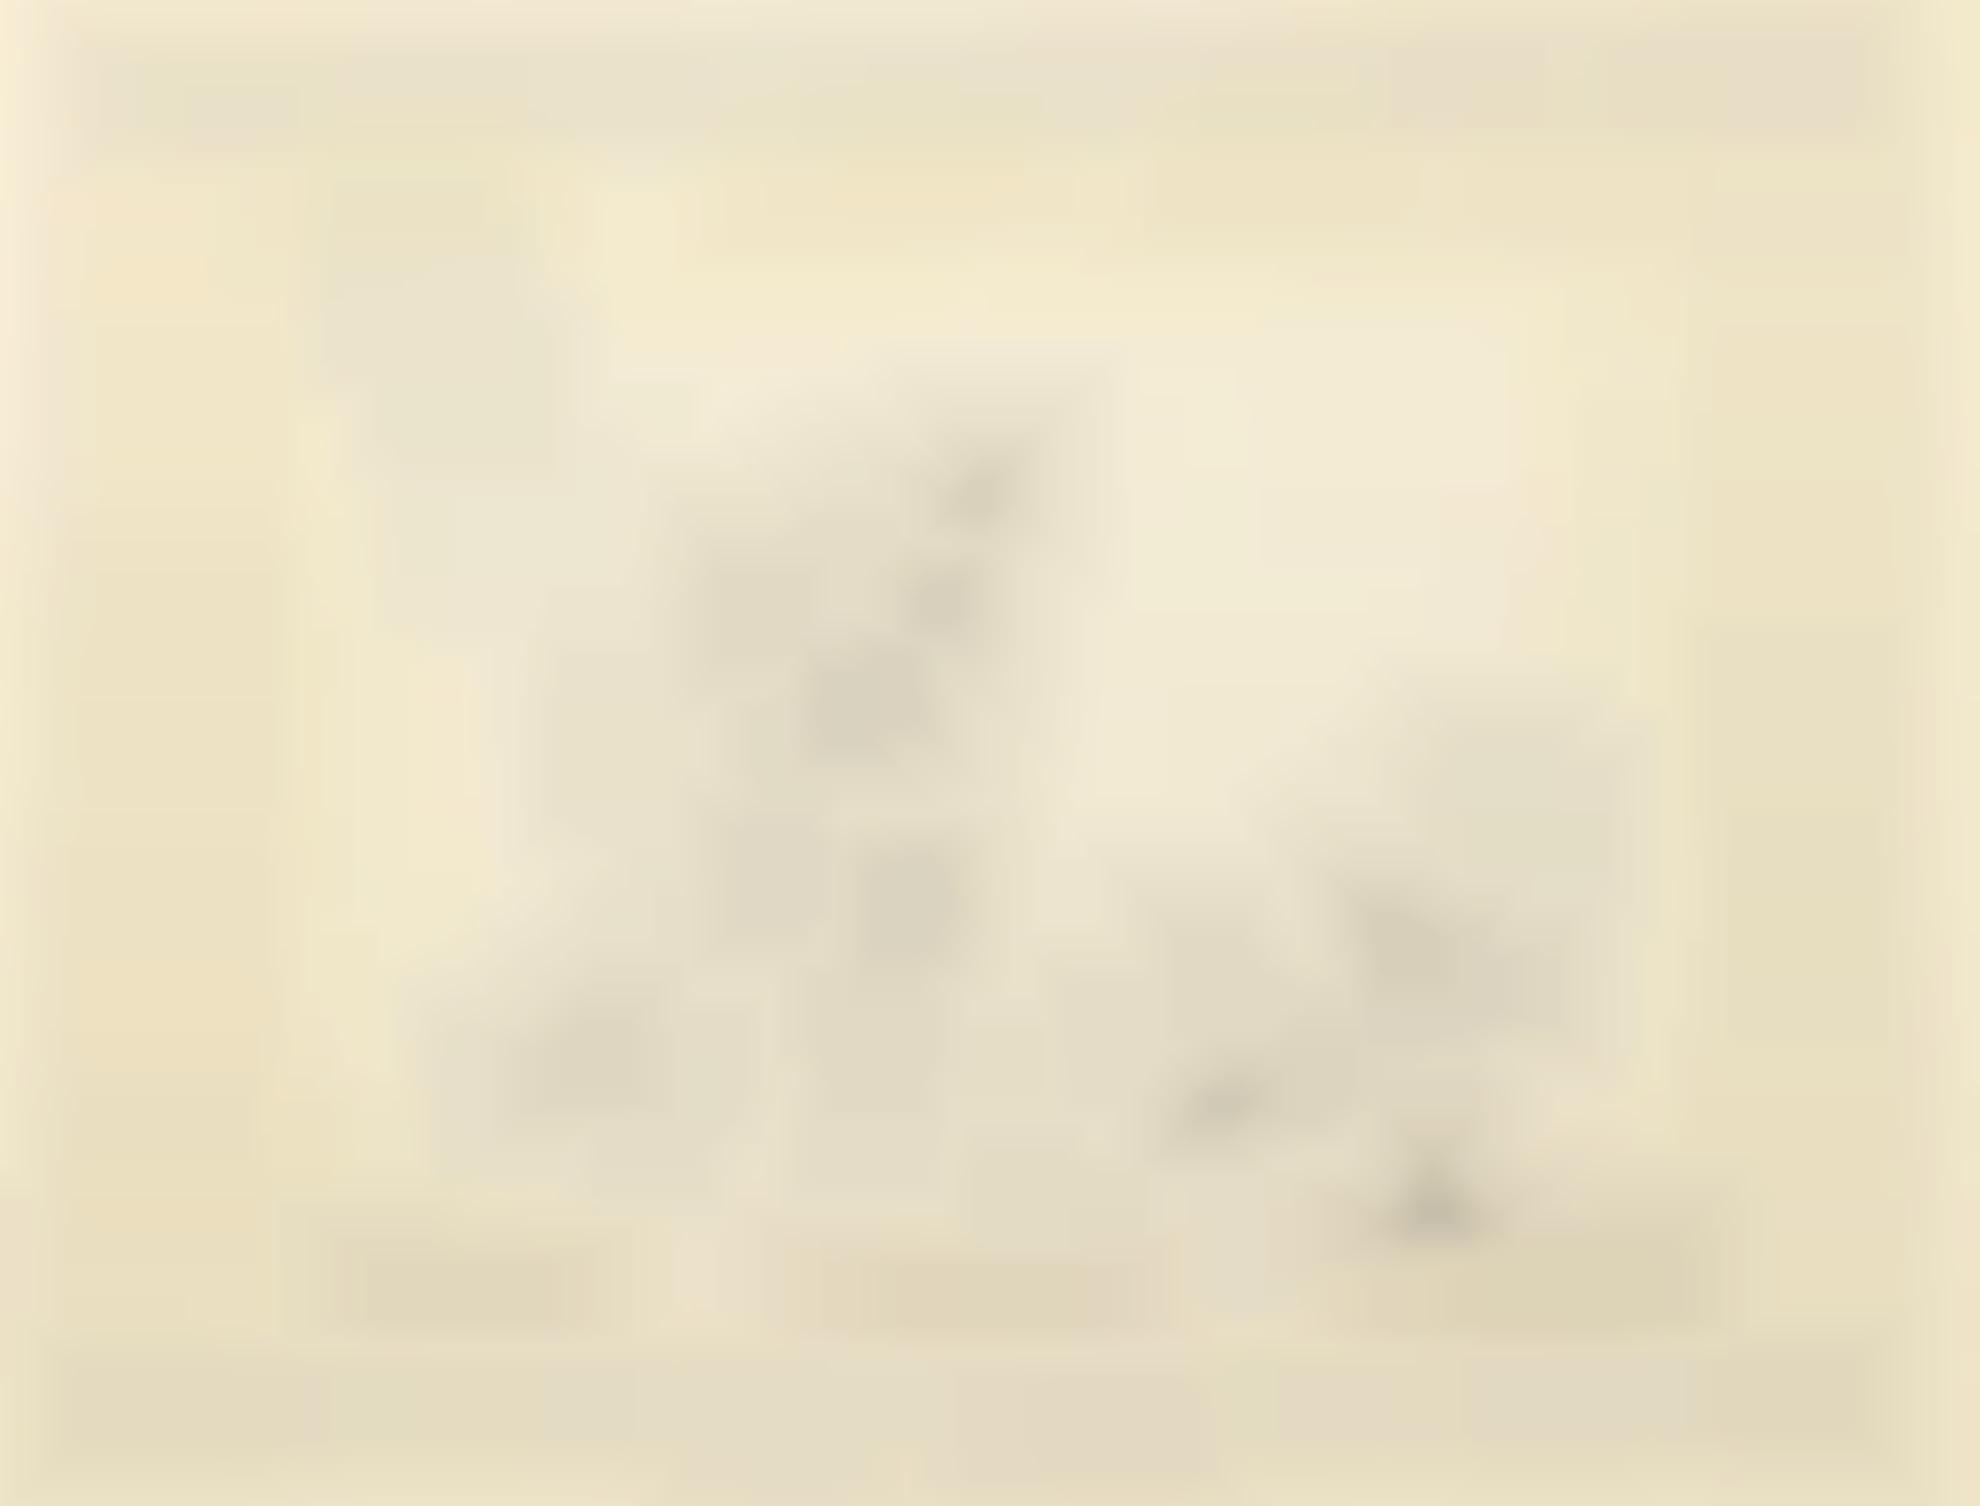 Paul Klee-Da Nimm Ihn Denn! (Here, Take It Then!)-1929